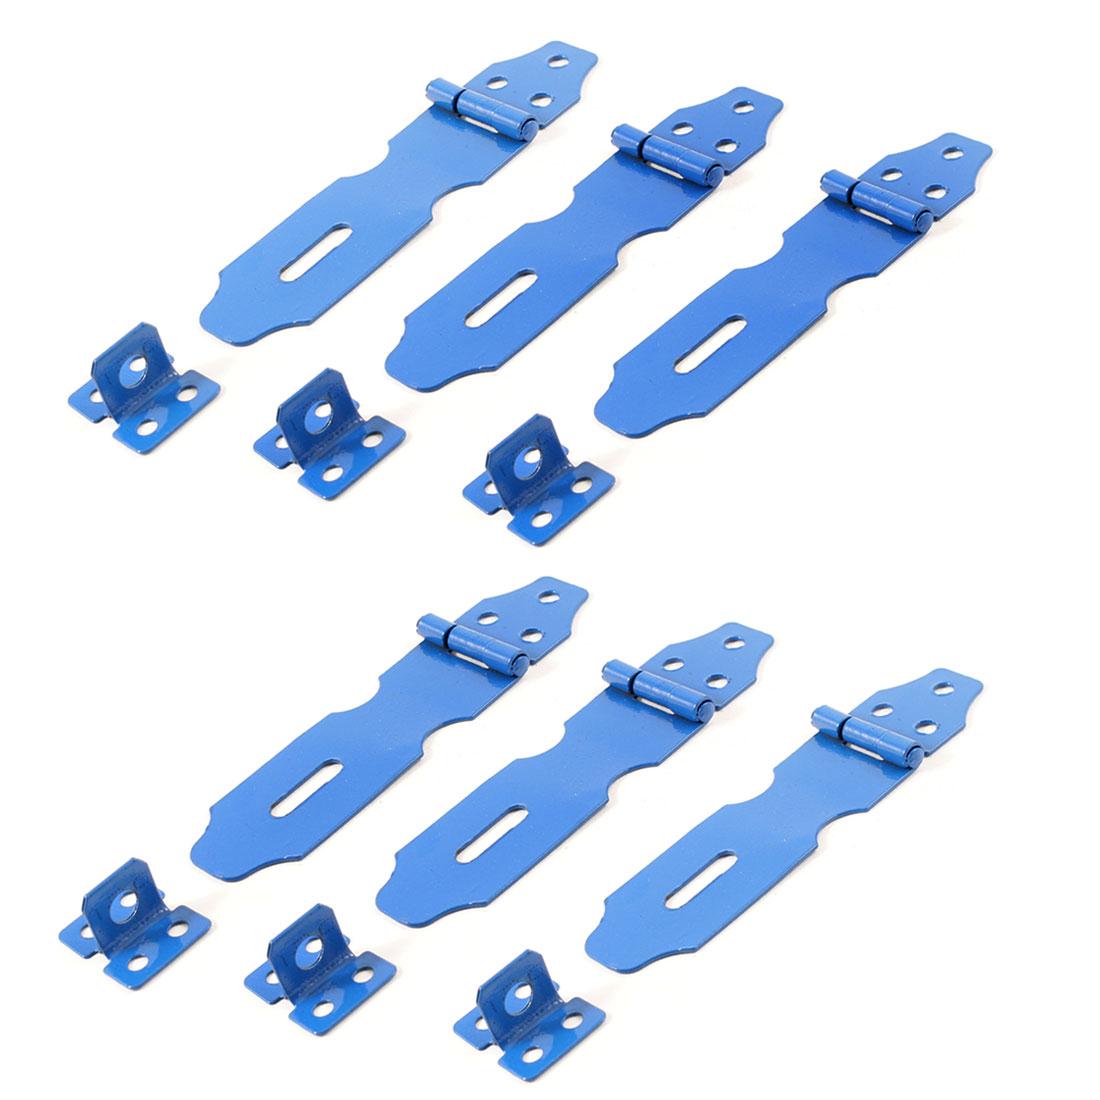 Blue Metal Cabinet Cupboard Gates Padlock Latch Door Hasp Staple 6 Sets(China (Mainland))